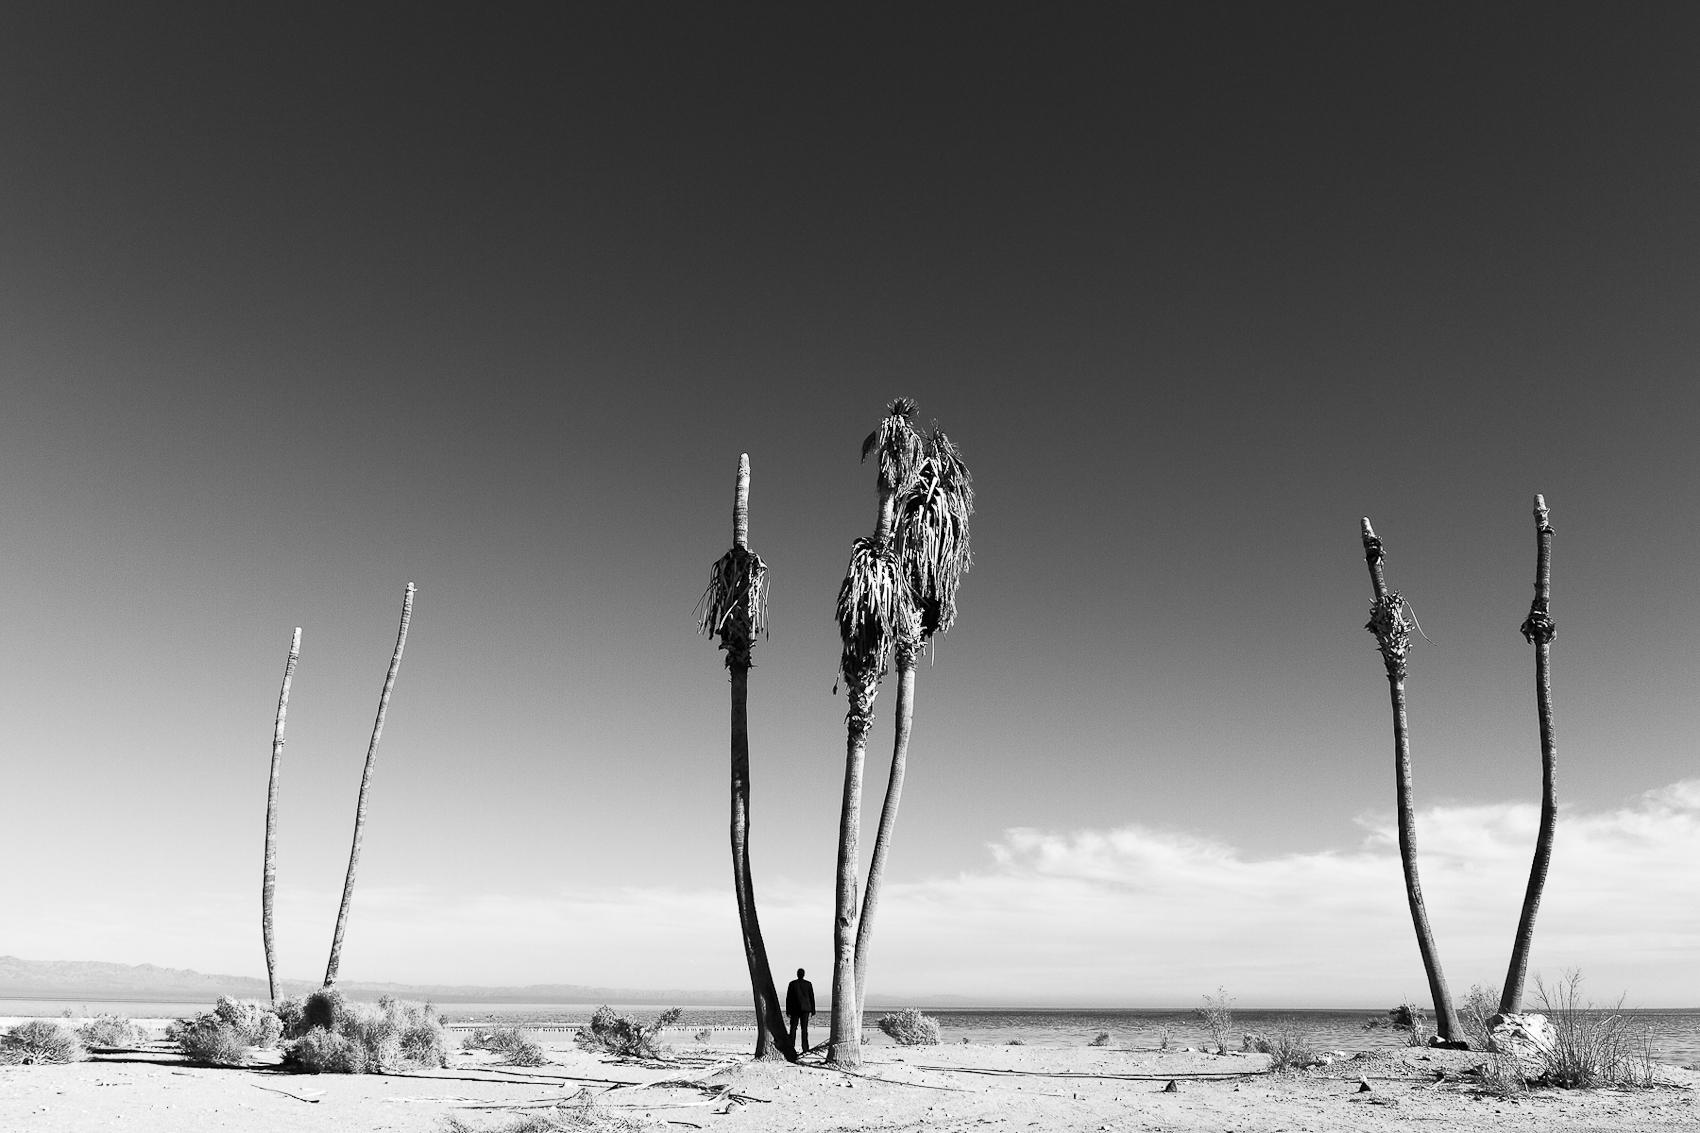 Self Portrait, Paradise Avenue, Salton Sea, 2013